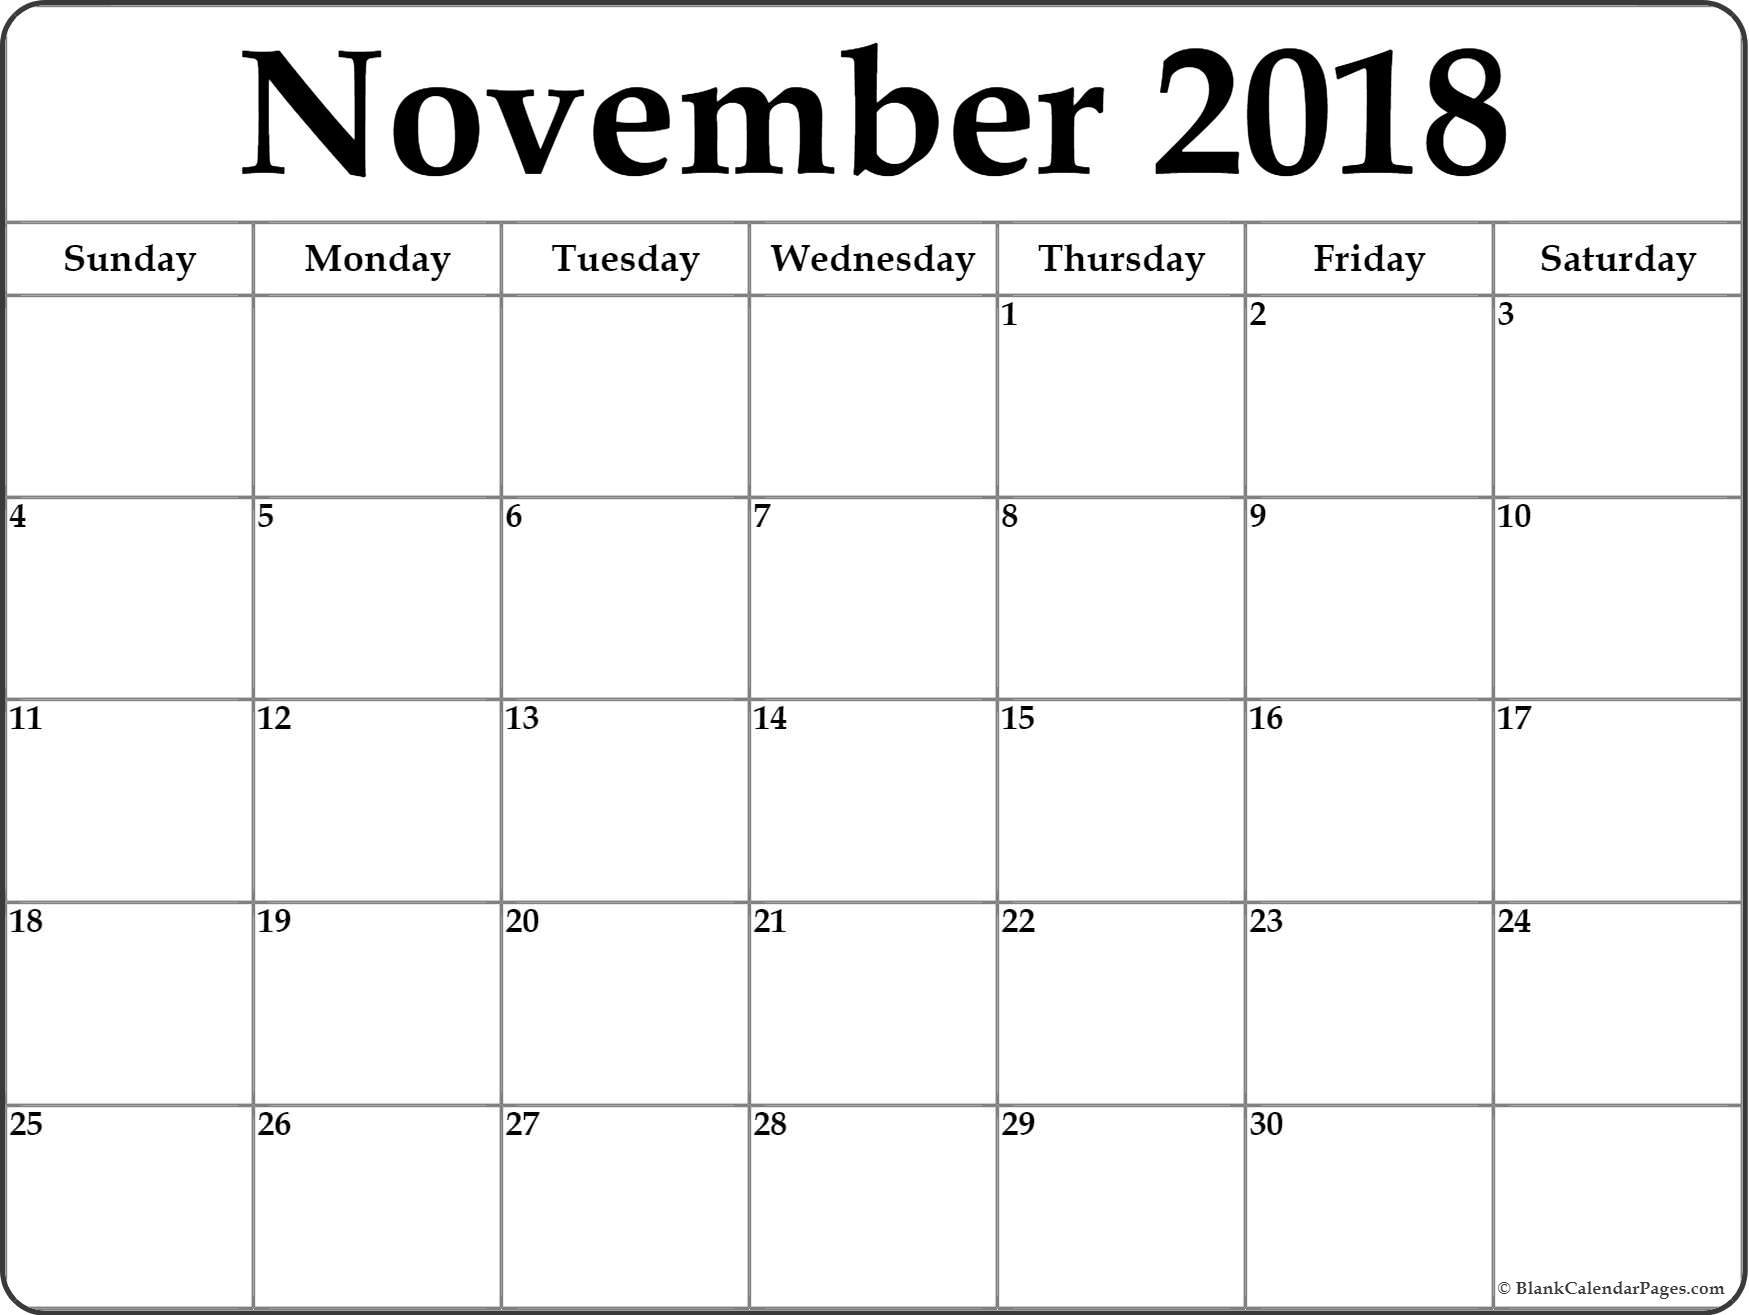 November 2018 Calendar | Free Printable Monthly Calendars pertaining to Blank Printable November Calendar